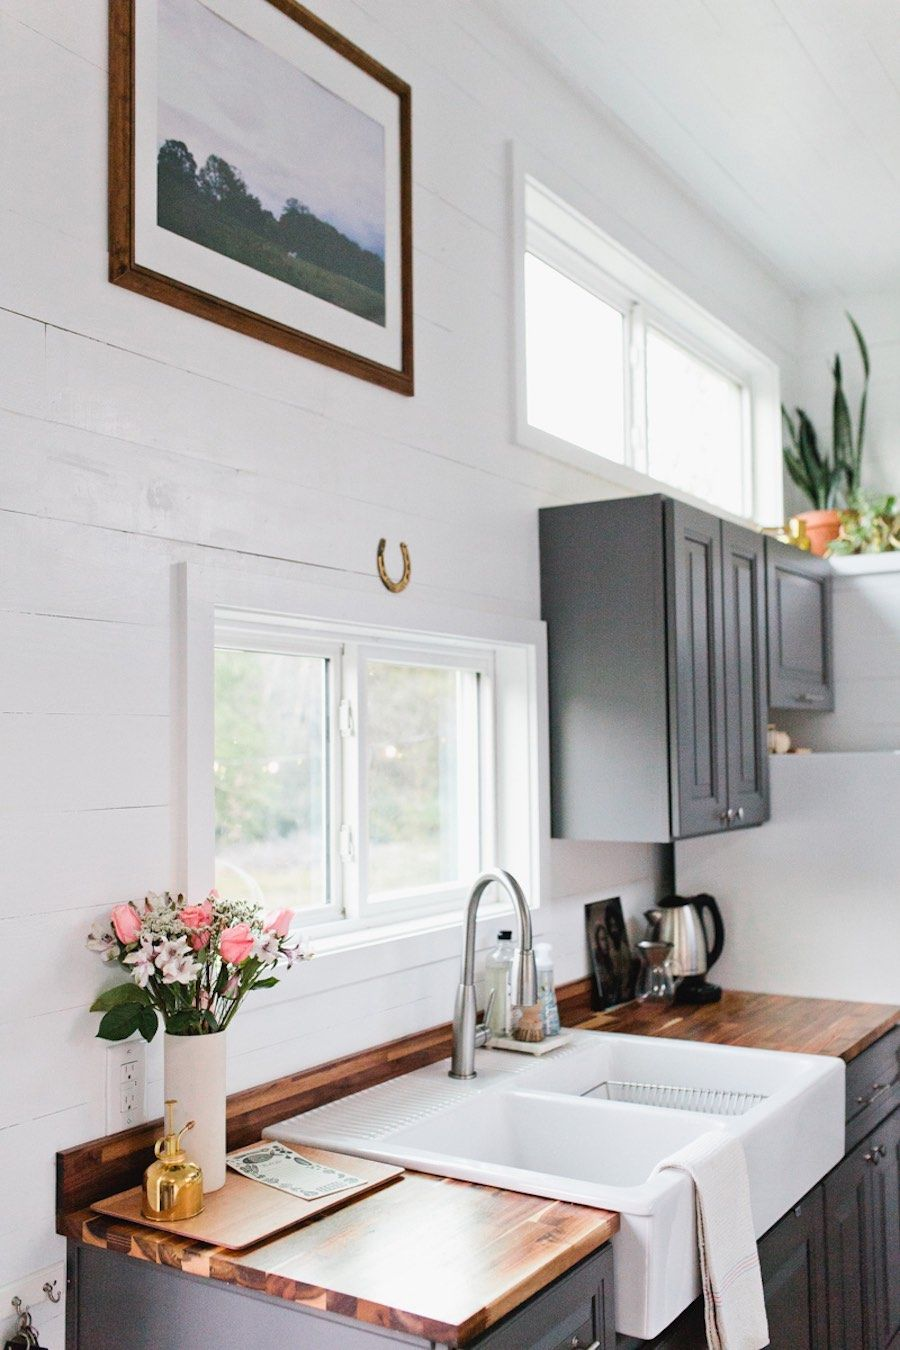 golden-american-tiny-house-3 | Dream House Ideas: Tiny House ...